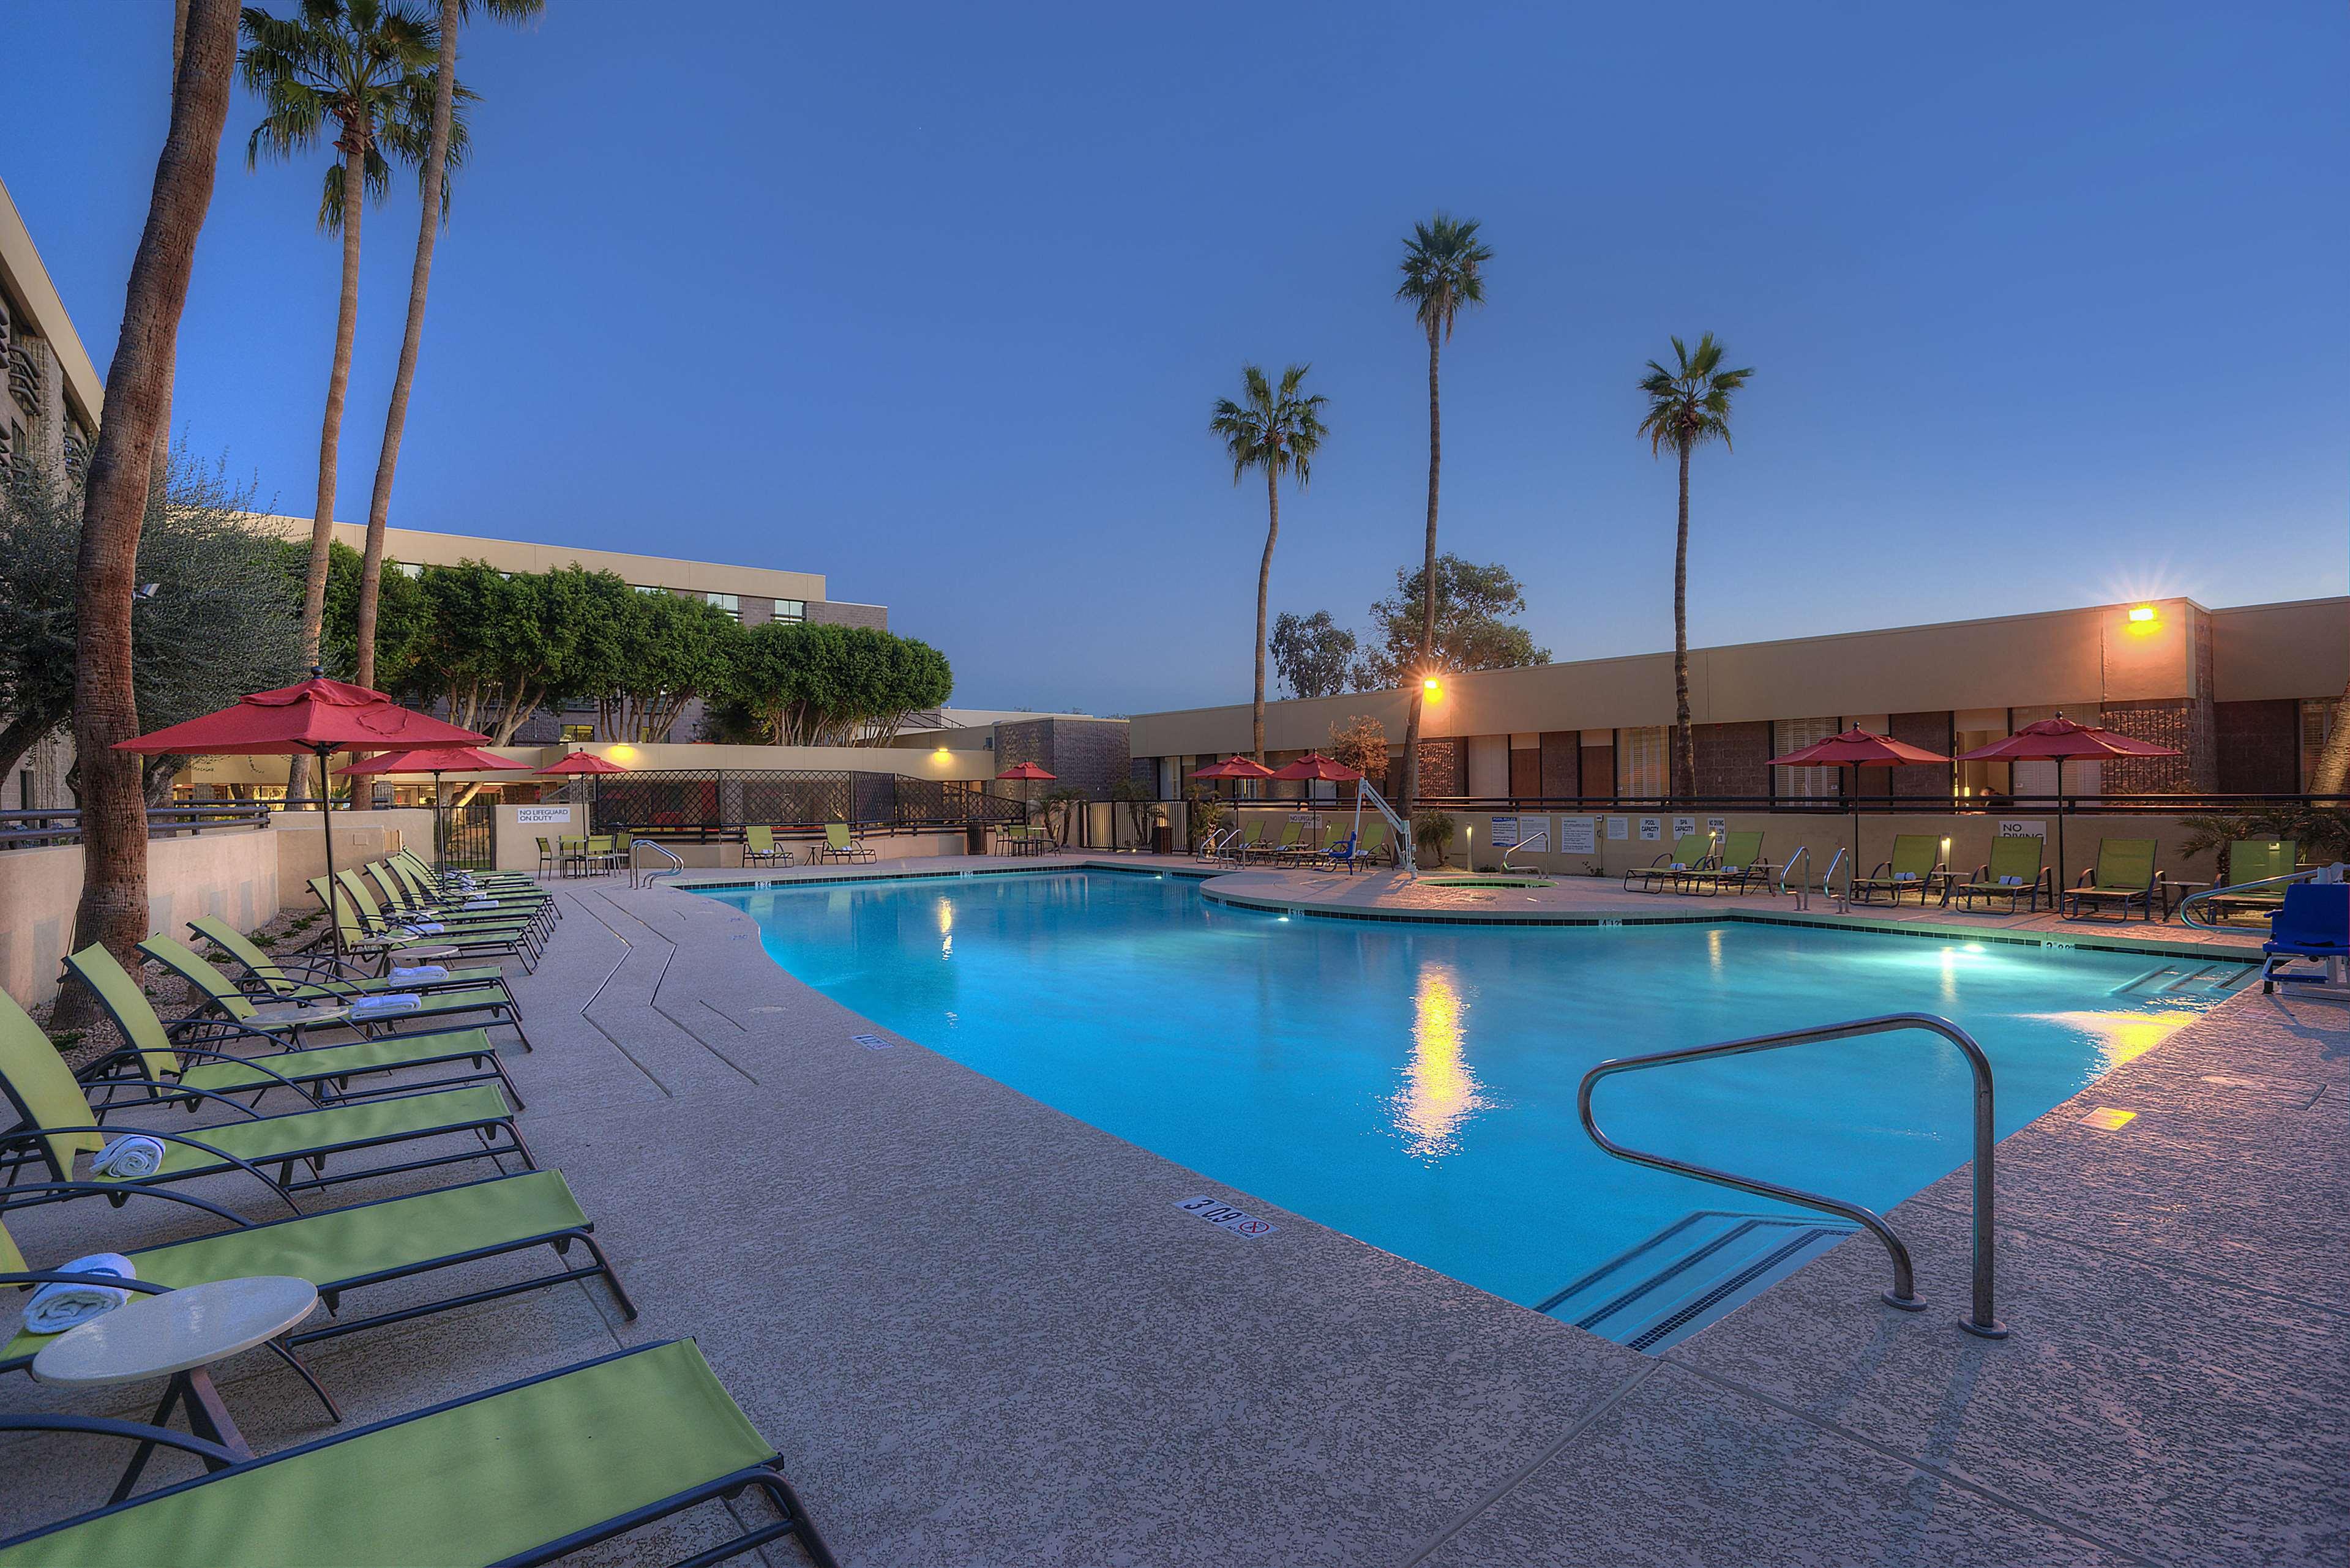 DoubleTree by Hilton Phoenix North image 3